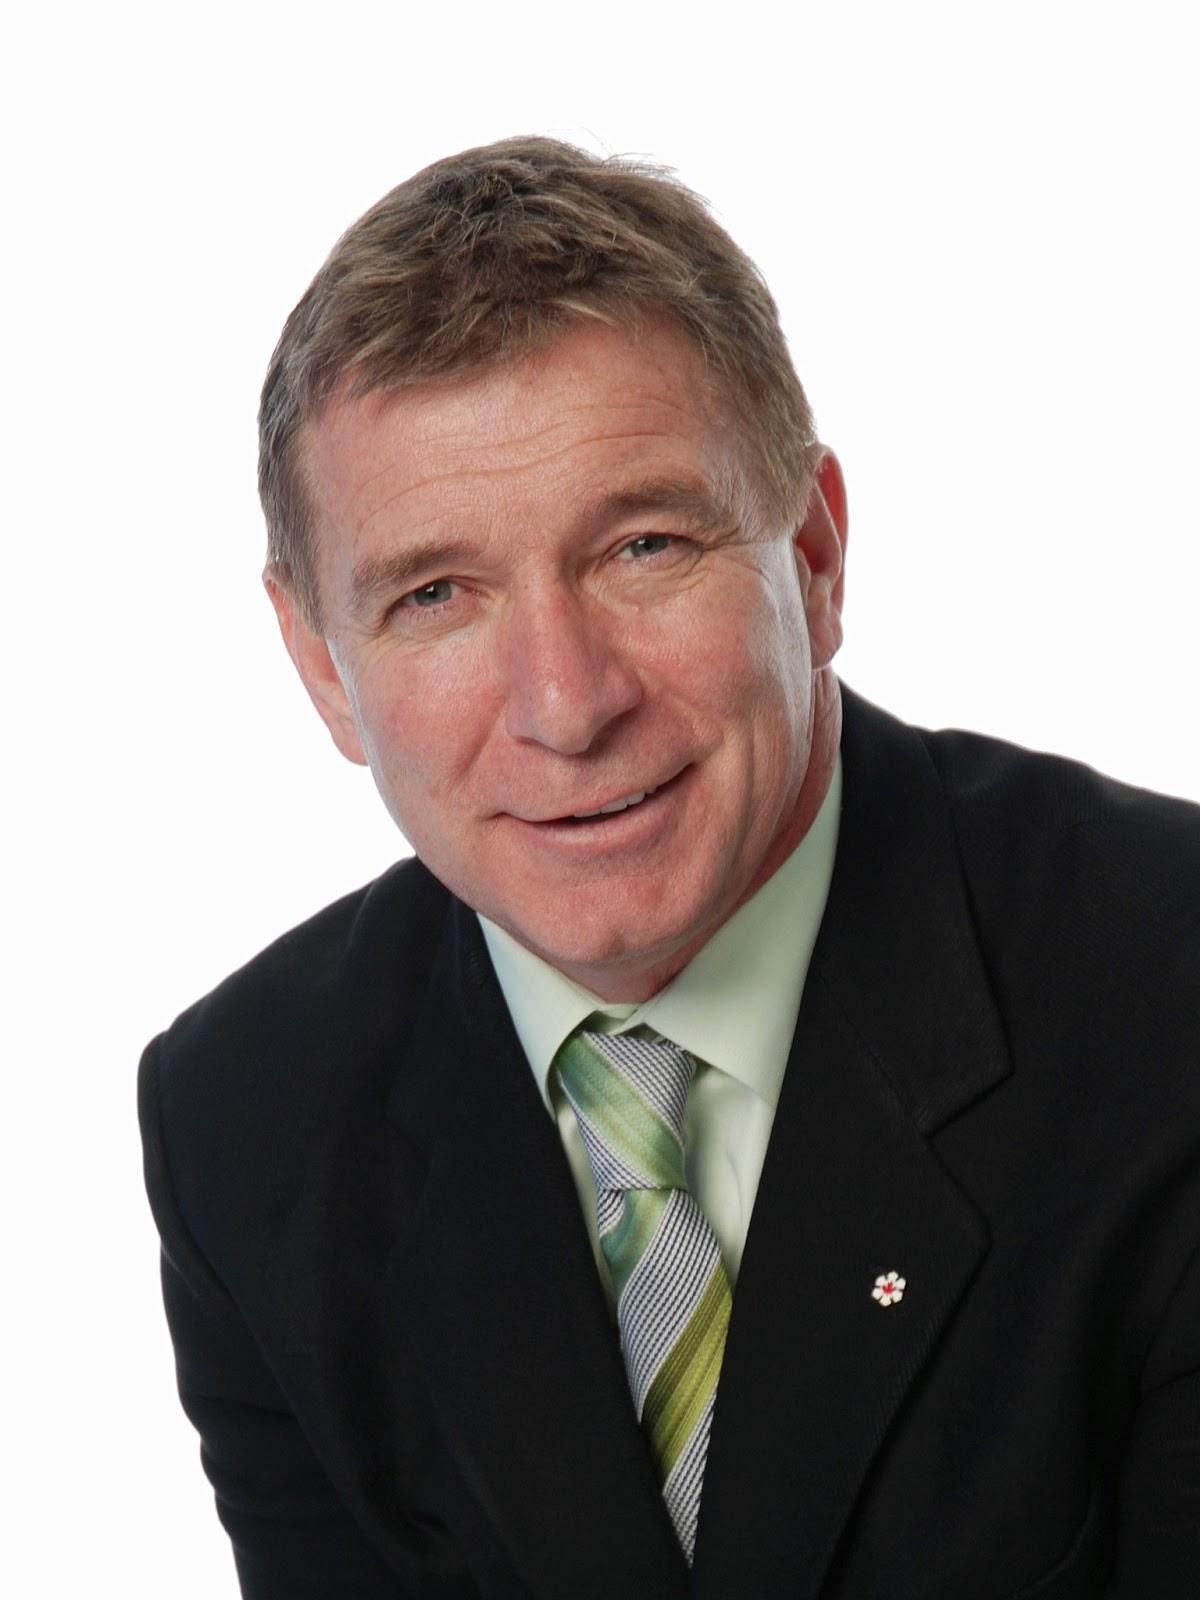 Rick hansen founding chair of the fraser river sturgeon conservation